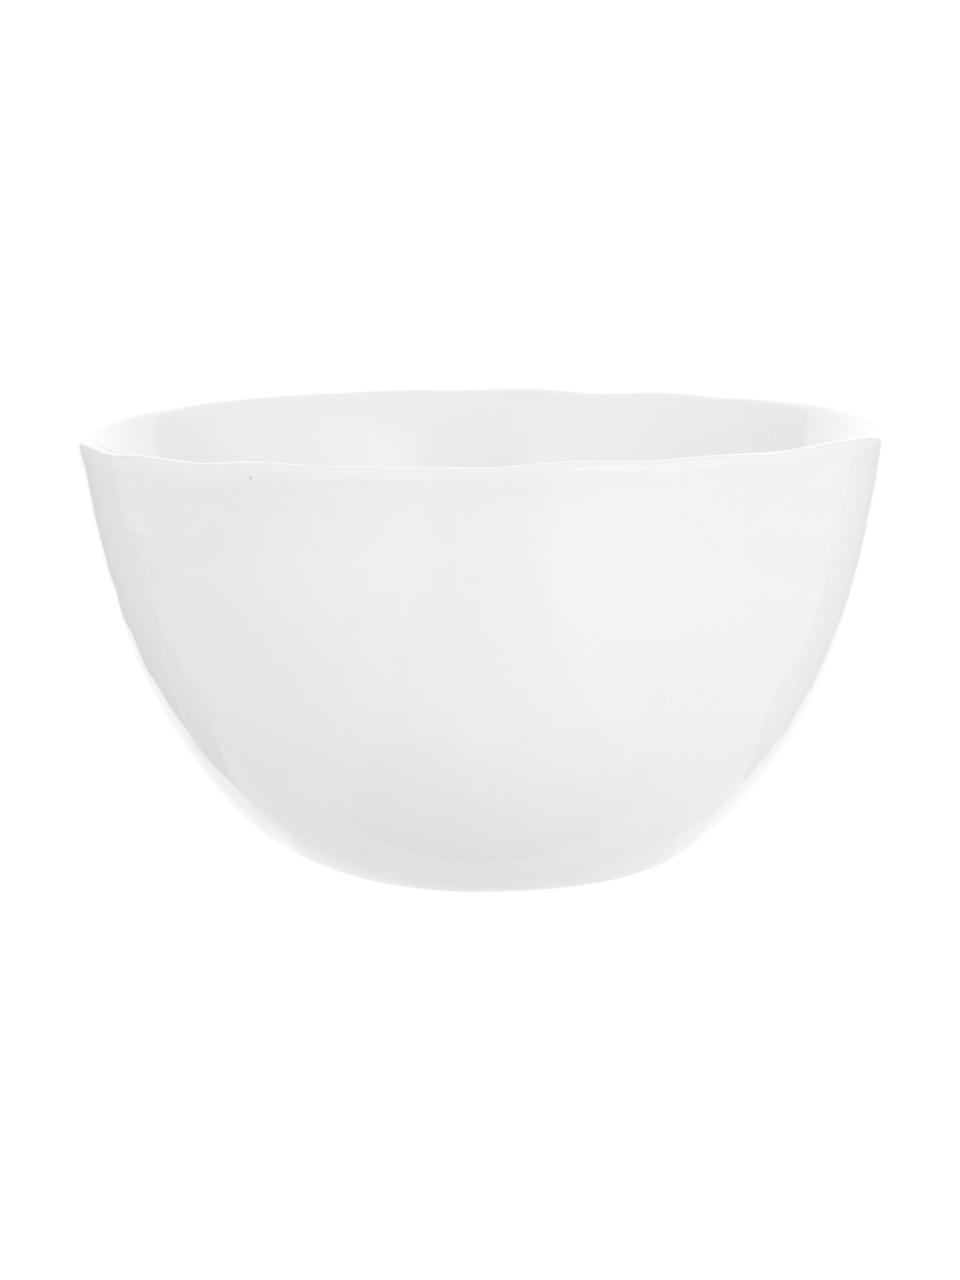 Ciotola con superficie irregolare Porcelino 6 pz, Porcellana, volutamente irregolare, Bianco, Ø 15 x Alt. 8 cm